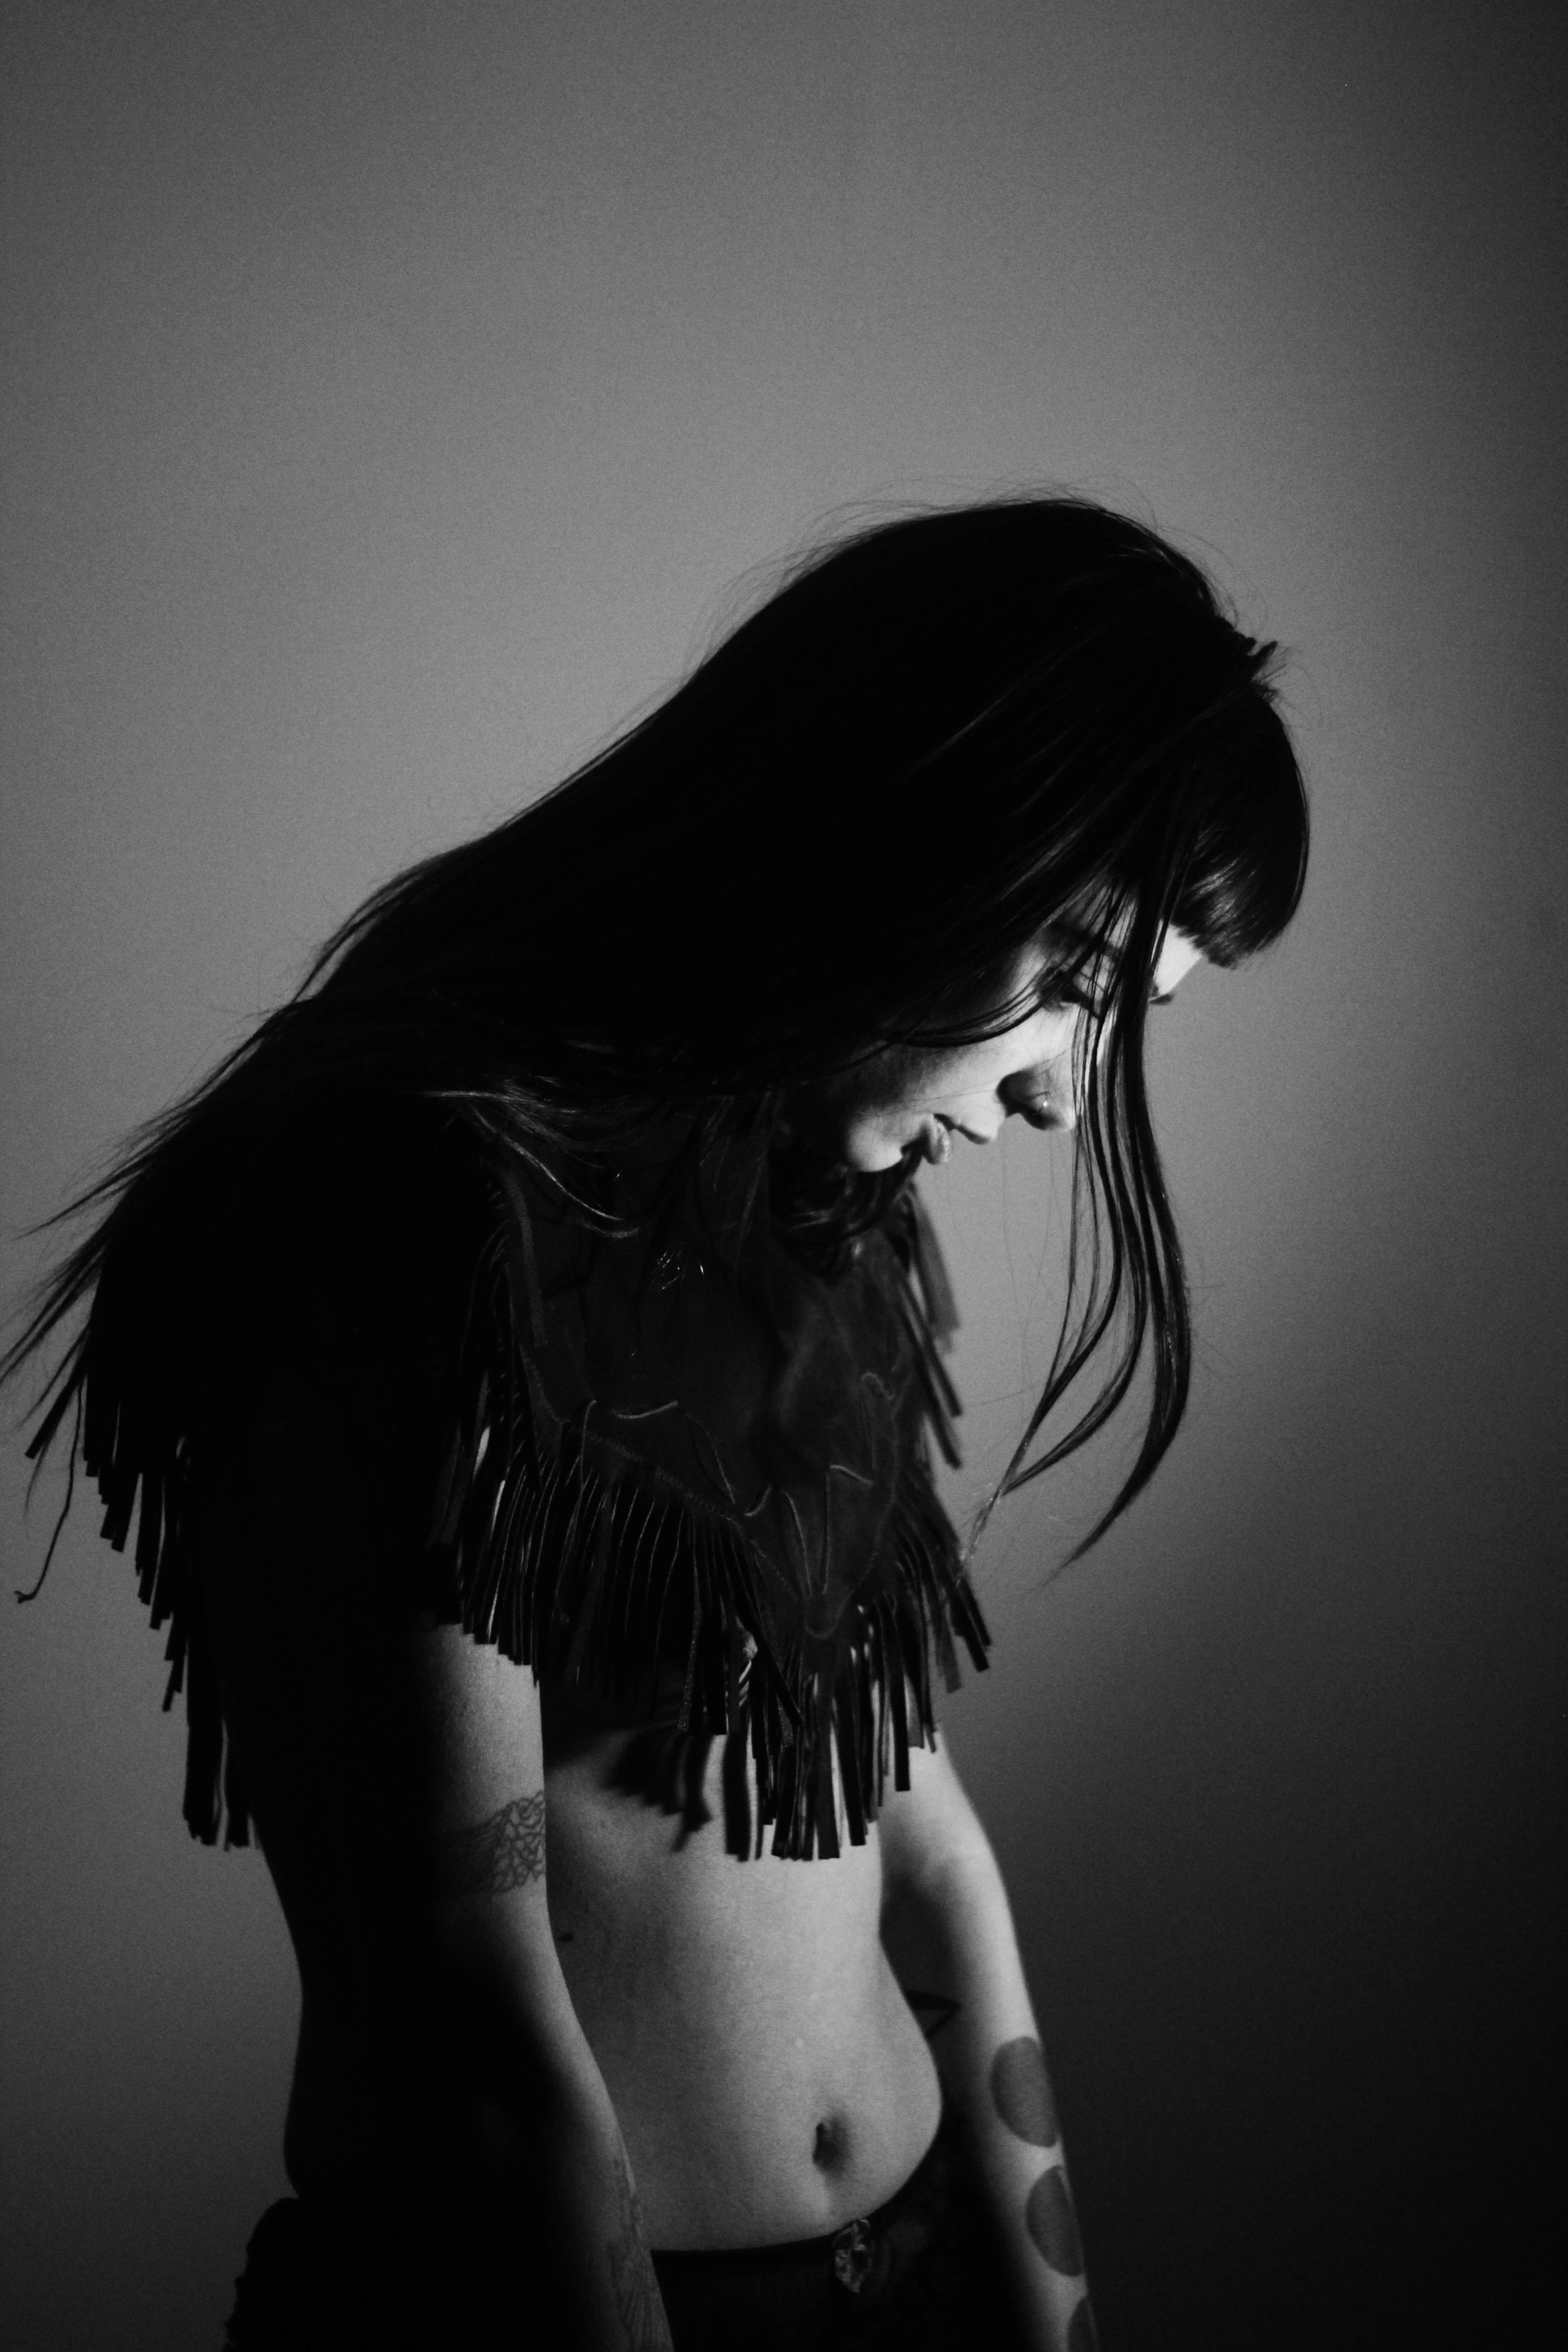 Carolina_Mencia-Sal_Nunkachov-22.jpg